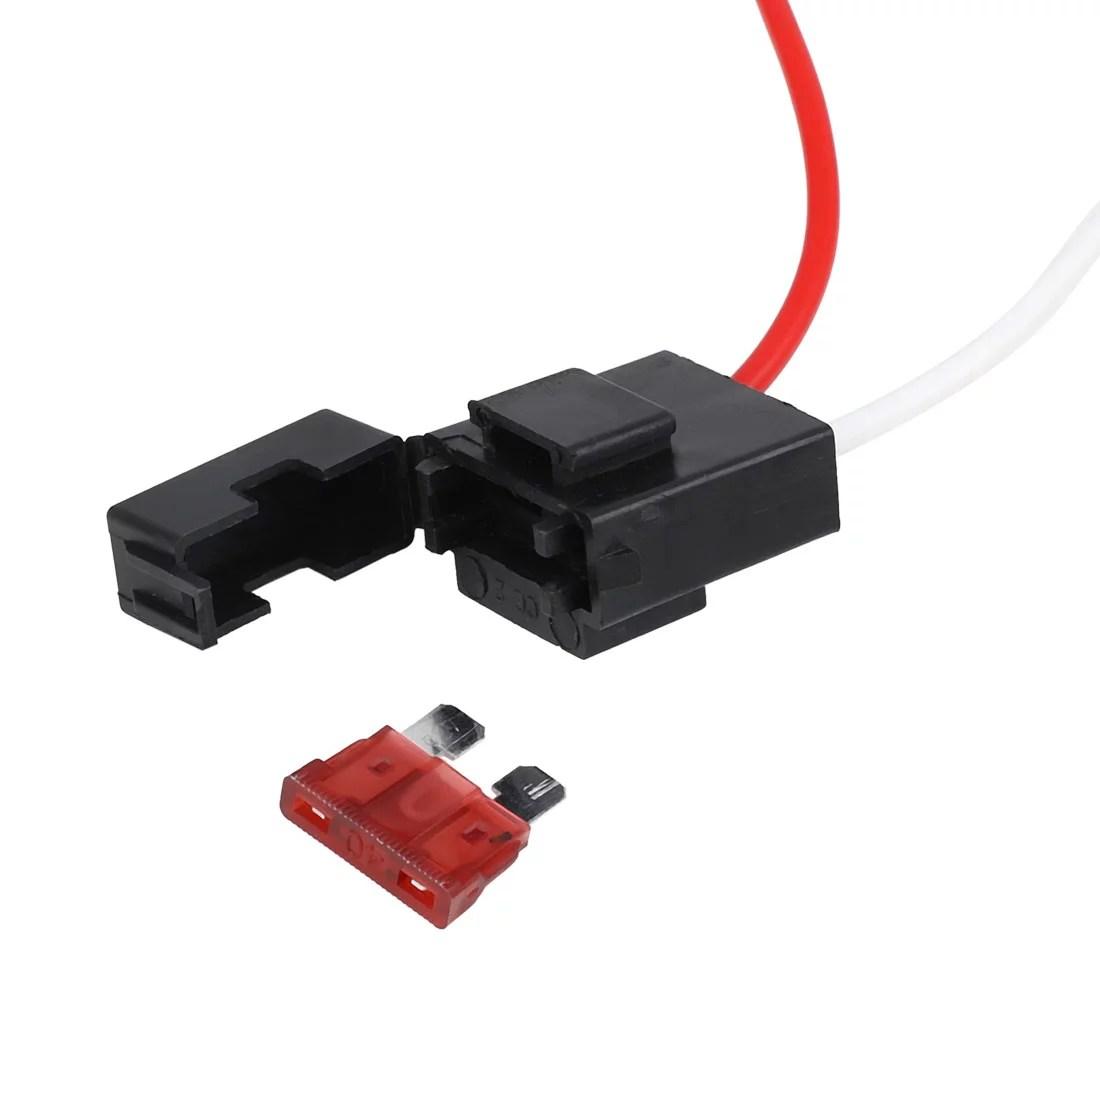 easy wiring harness kit car wiring diagram used easy wiring harness kit car [ 1100 x 1100 Pixel ]